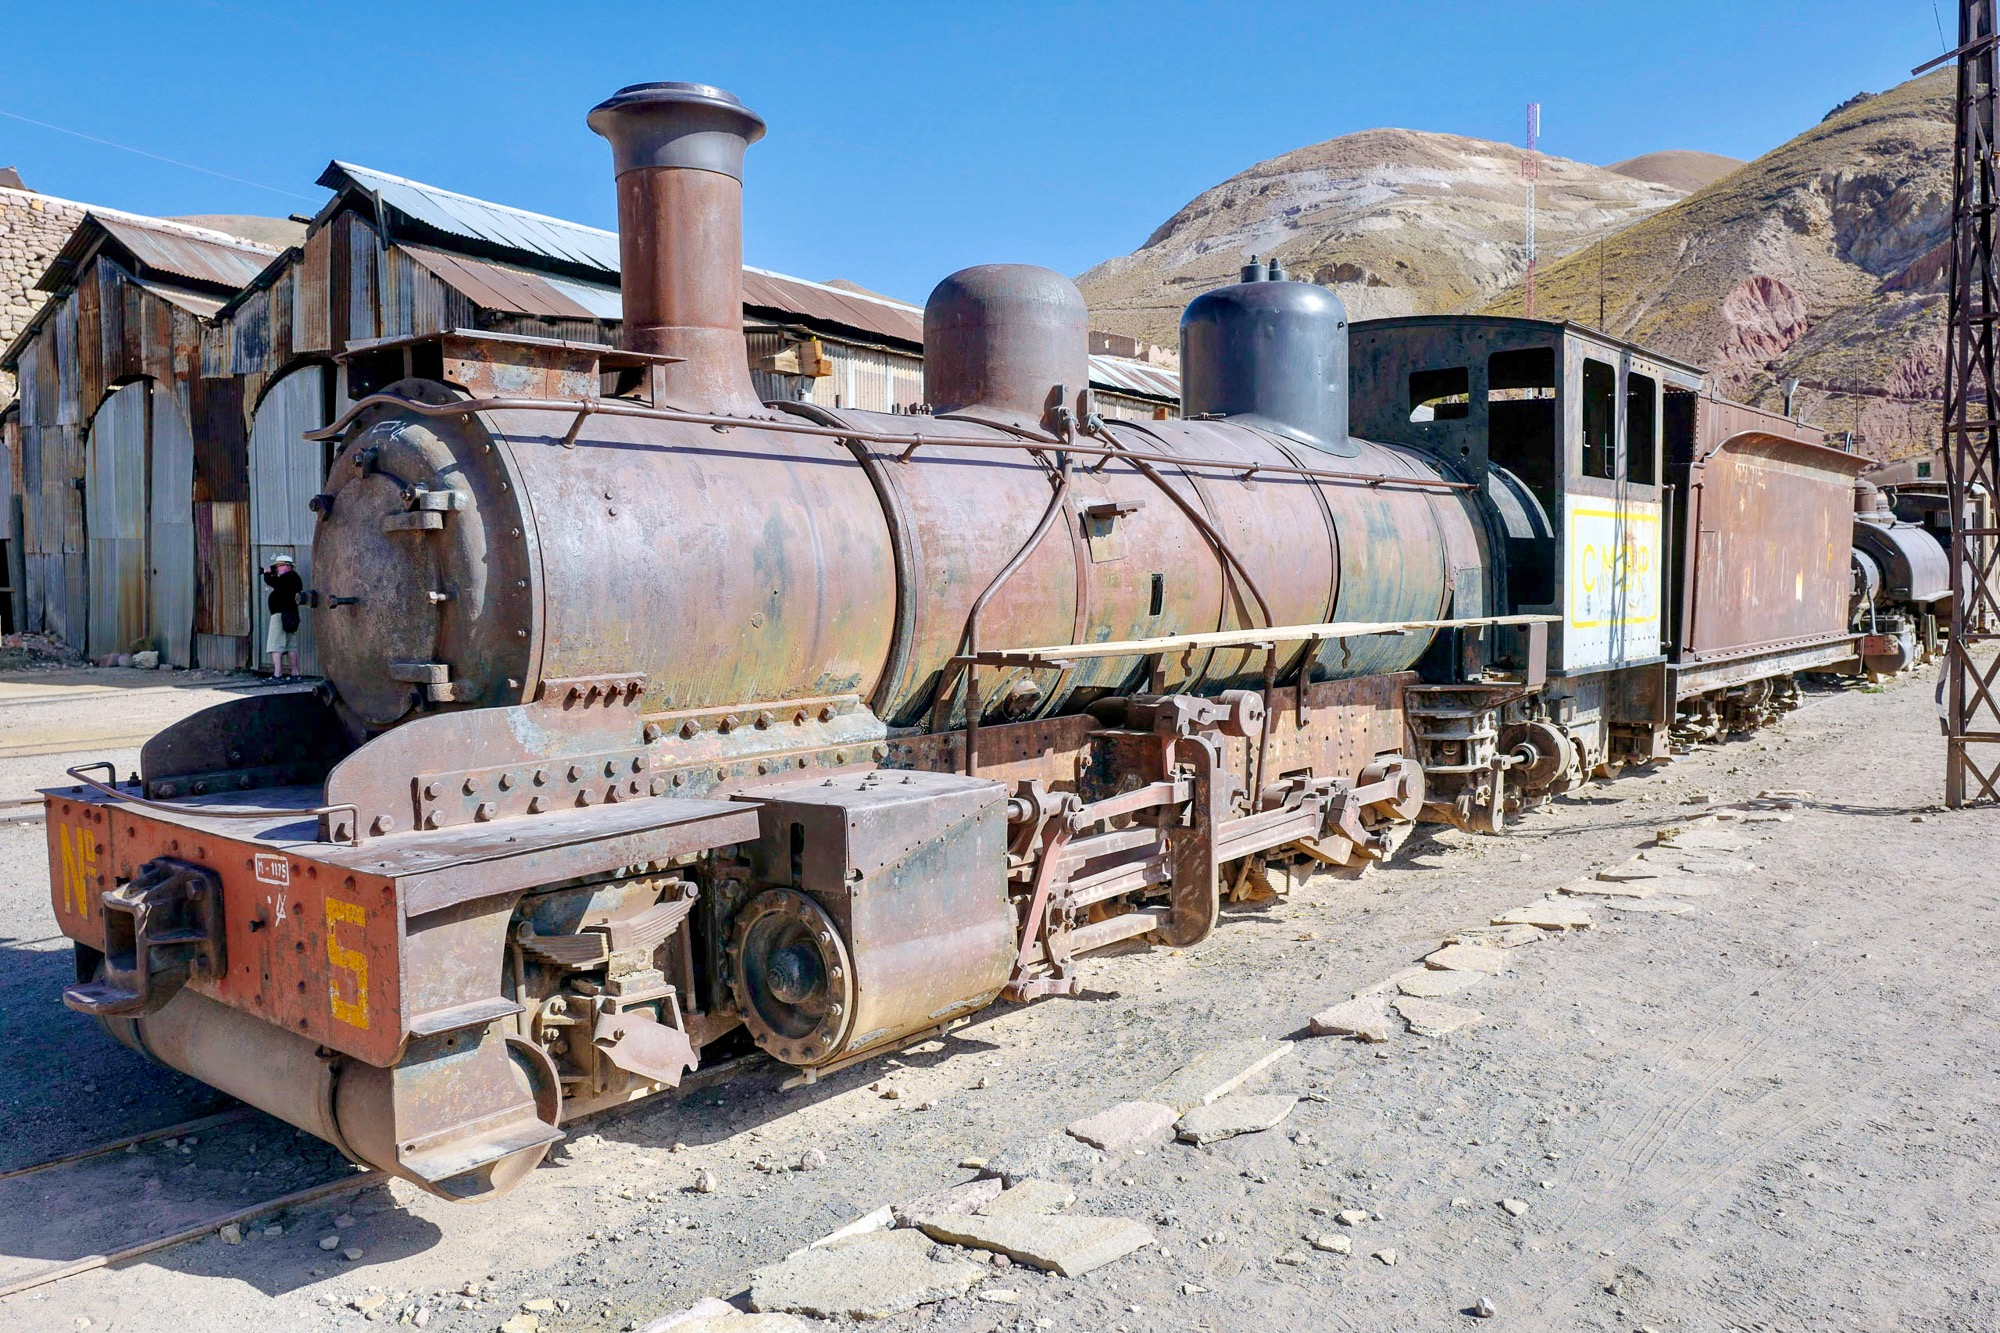 Abandoned Steam Locomotive in Pulacayo, Bolivia